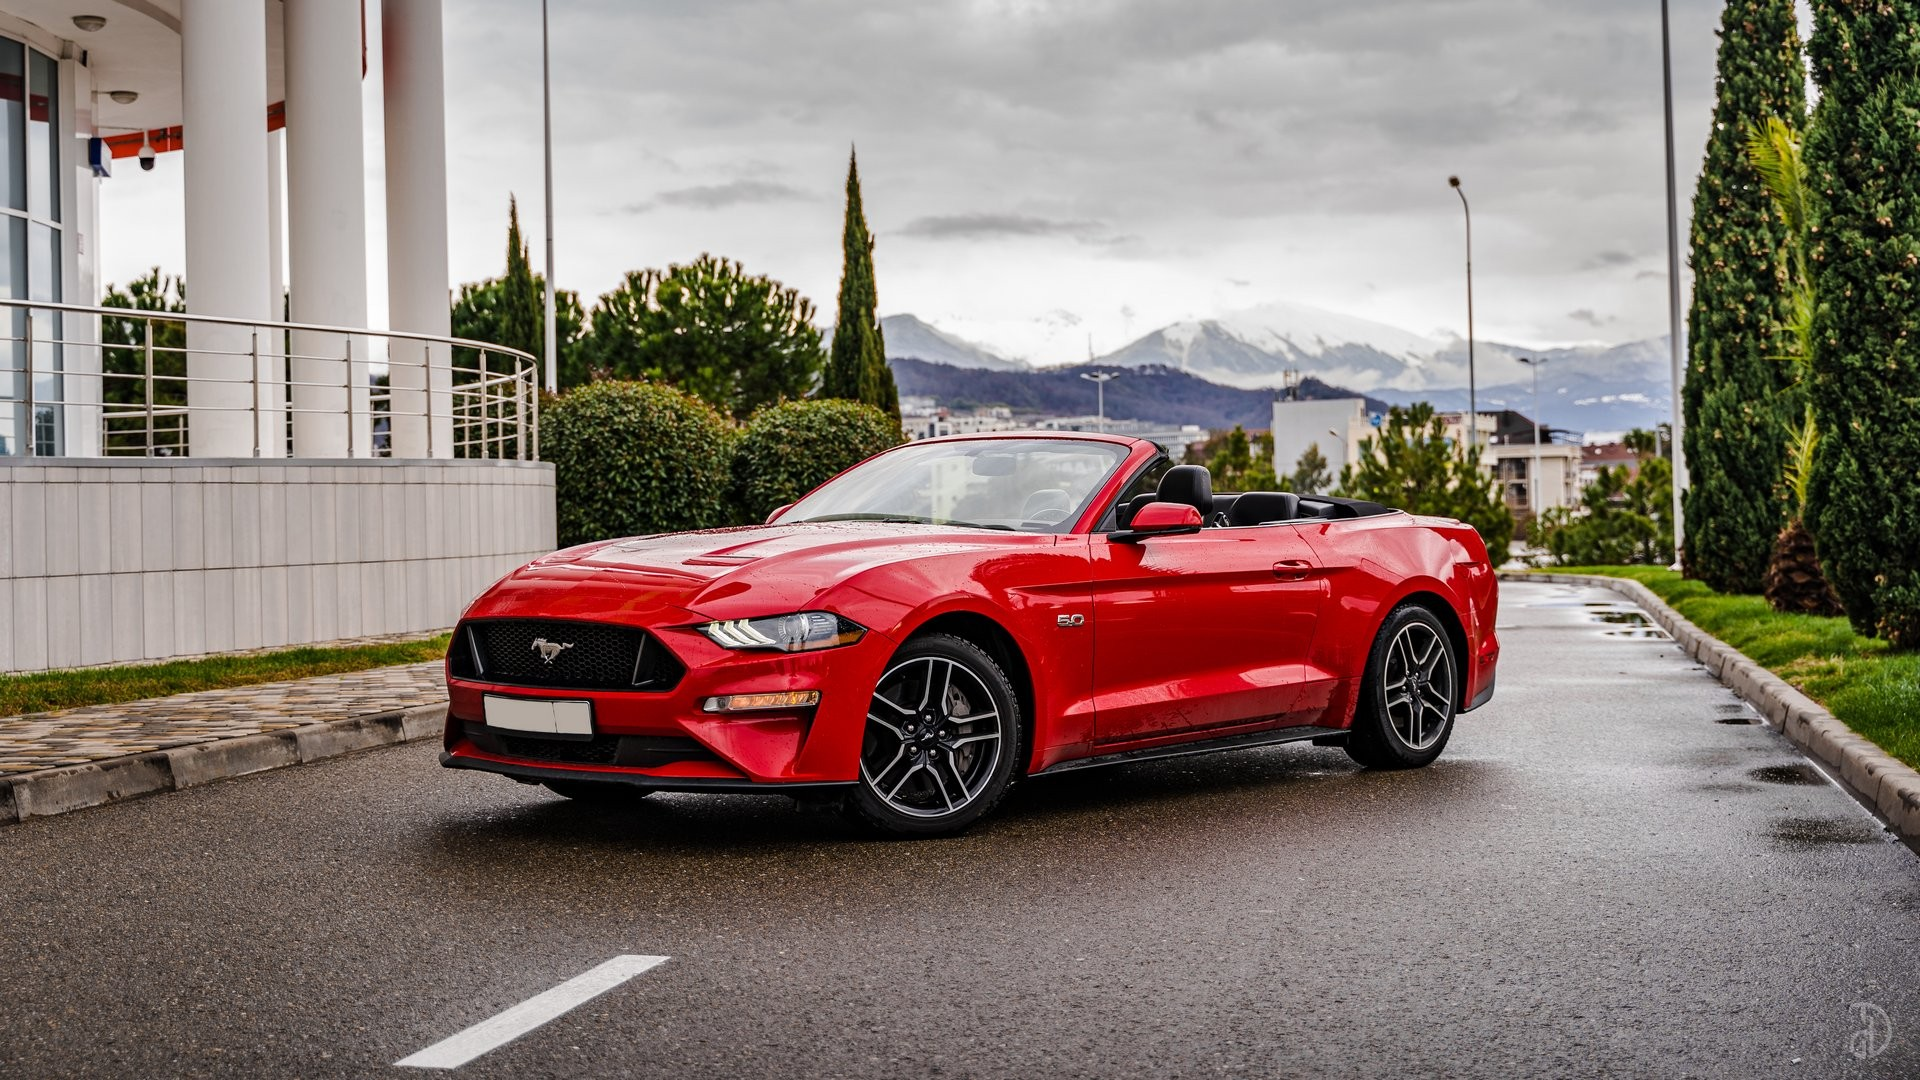 Аренда Ford Mustang GT 5.0 в Сочи. Фото 1